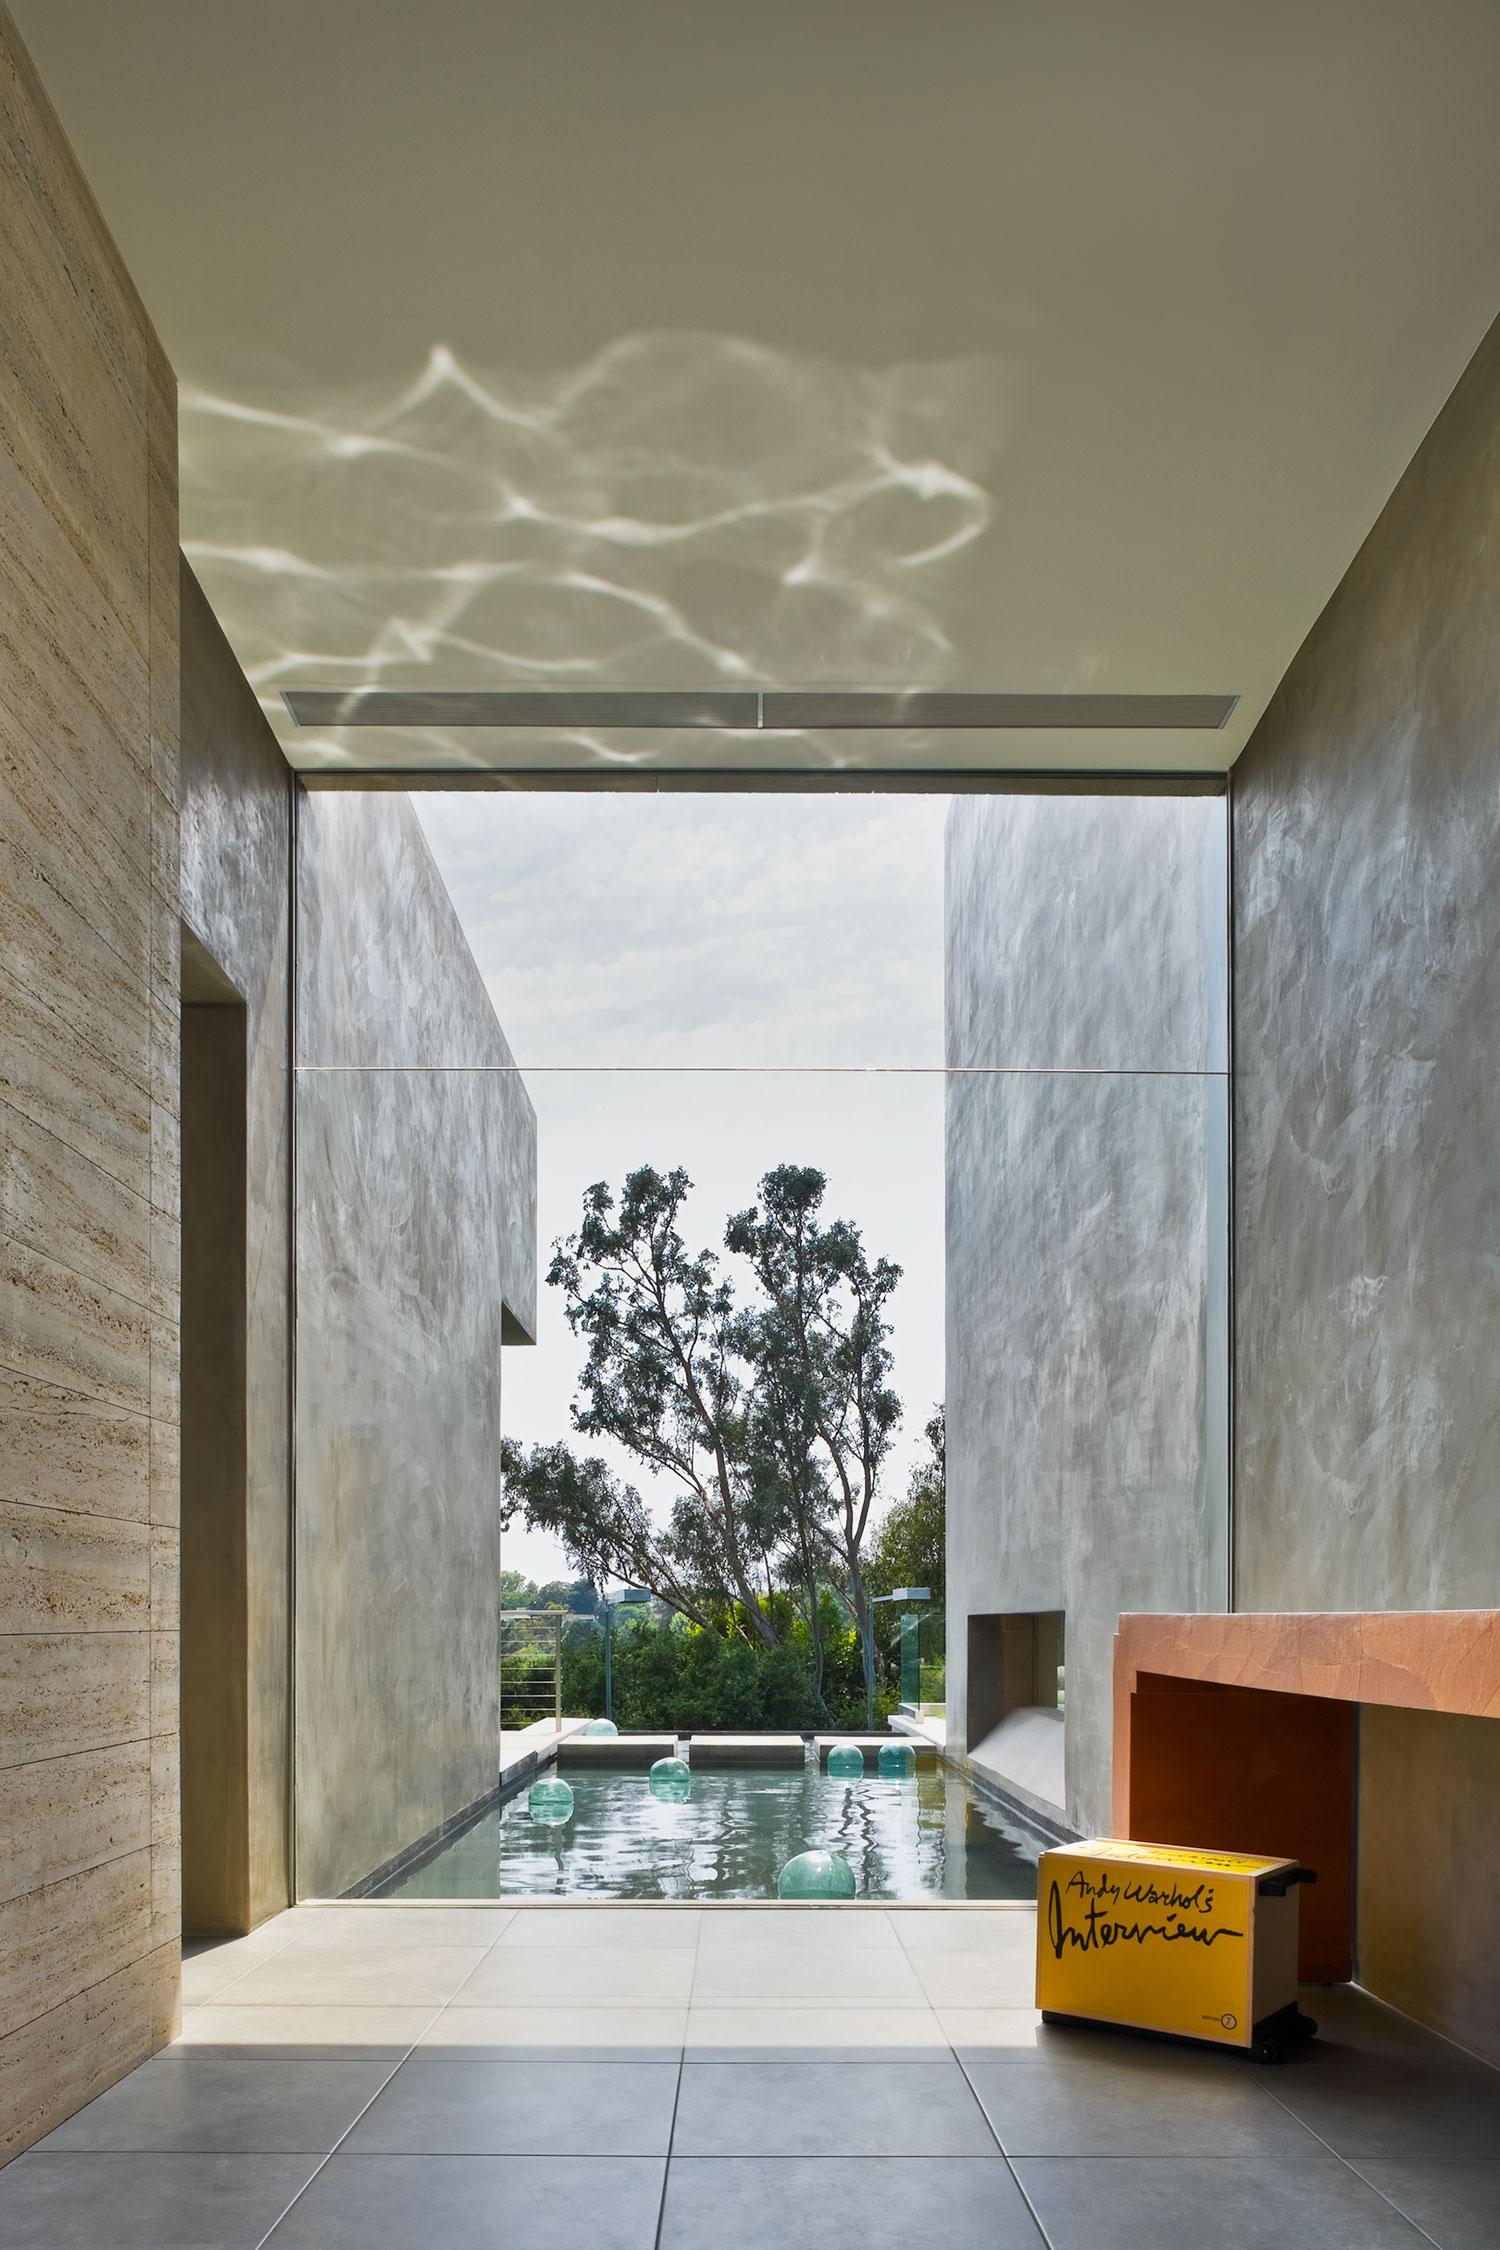 modern-architecture-residential-interior-stone-pool-shubindonaldson-bentley-residence-1